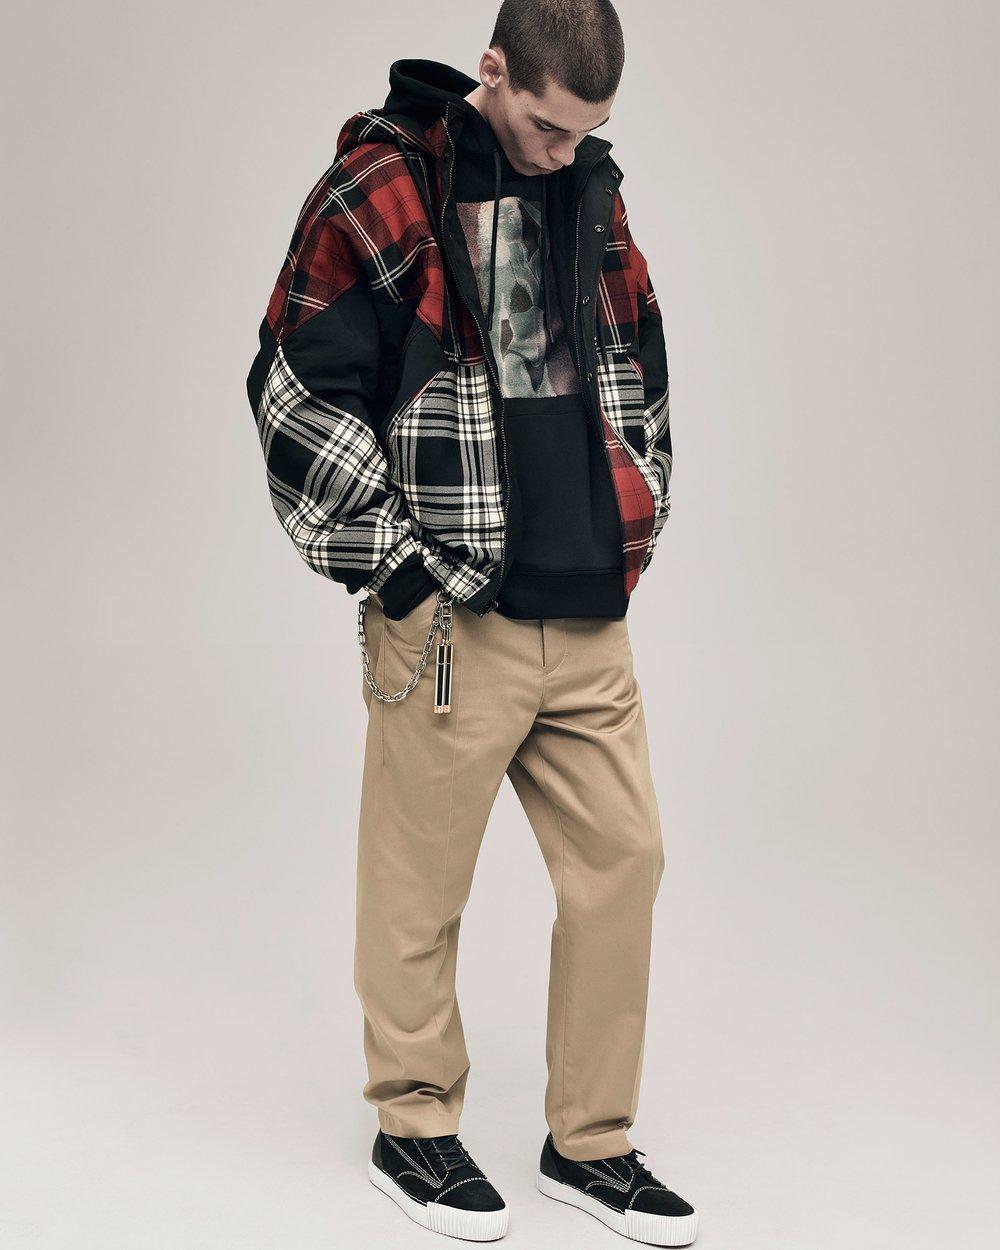 Alexander Wang Spring 2017 Menswear